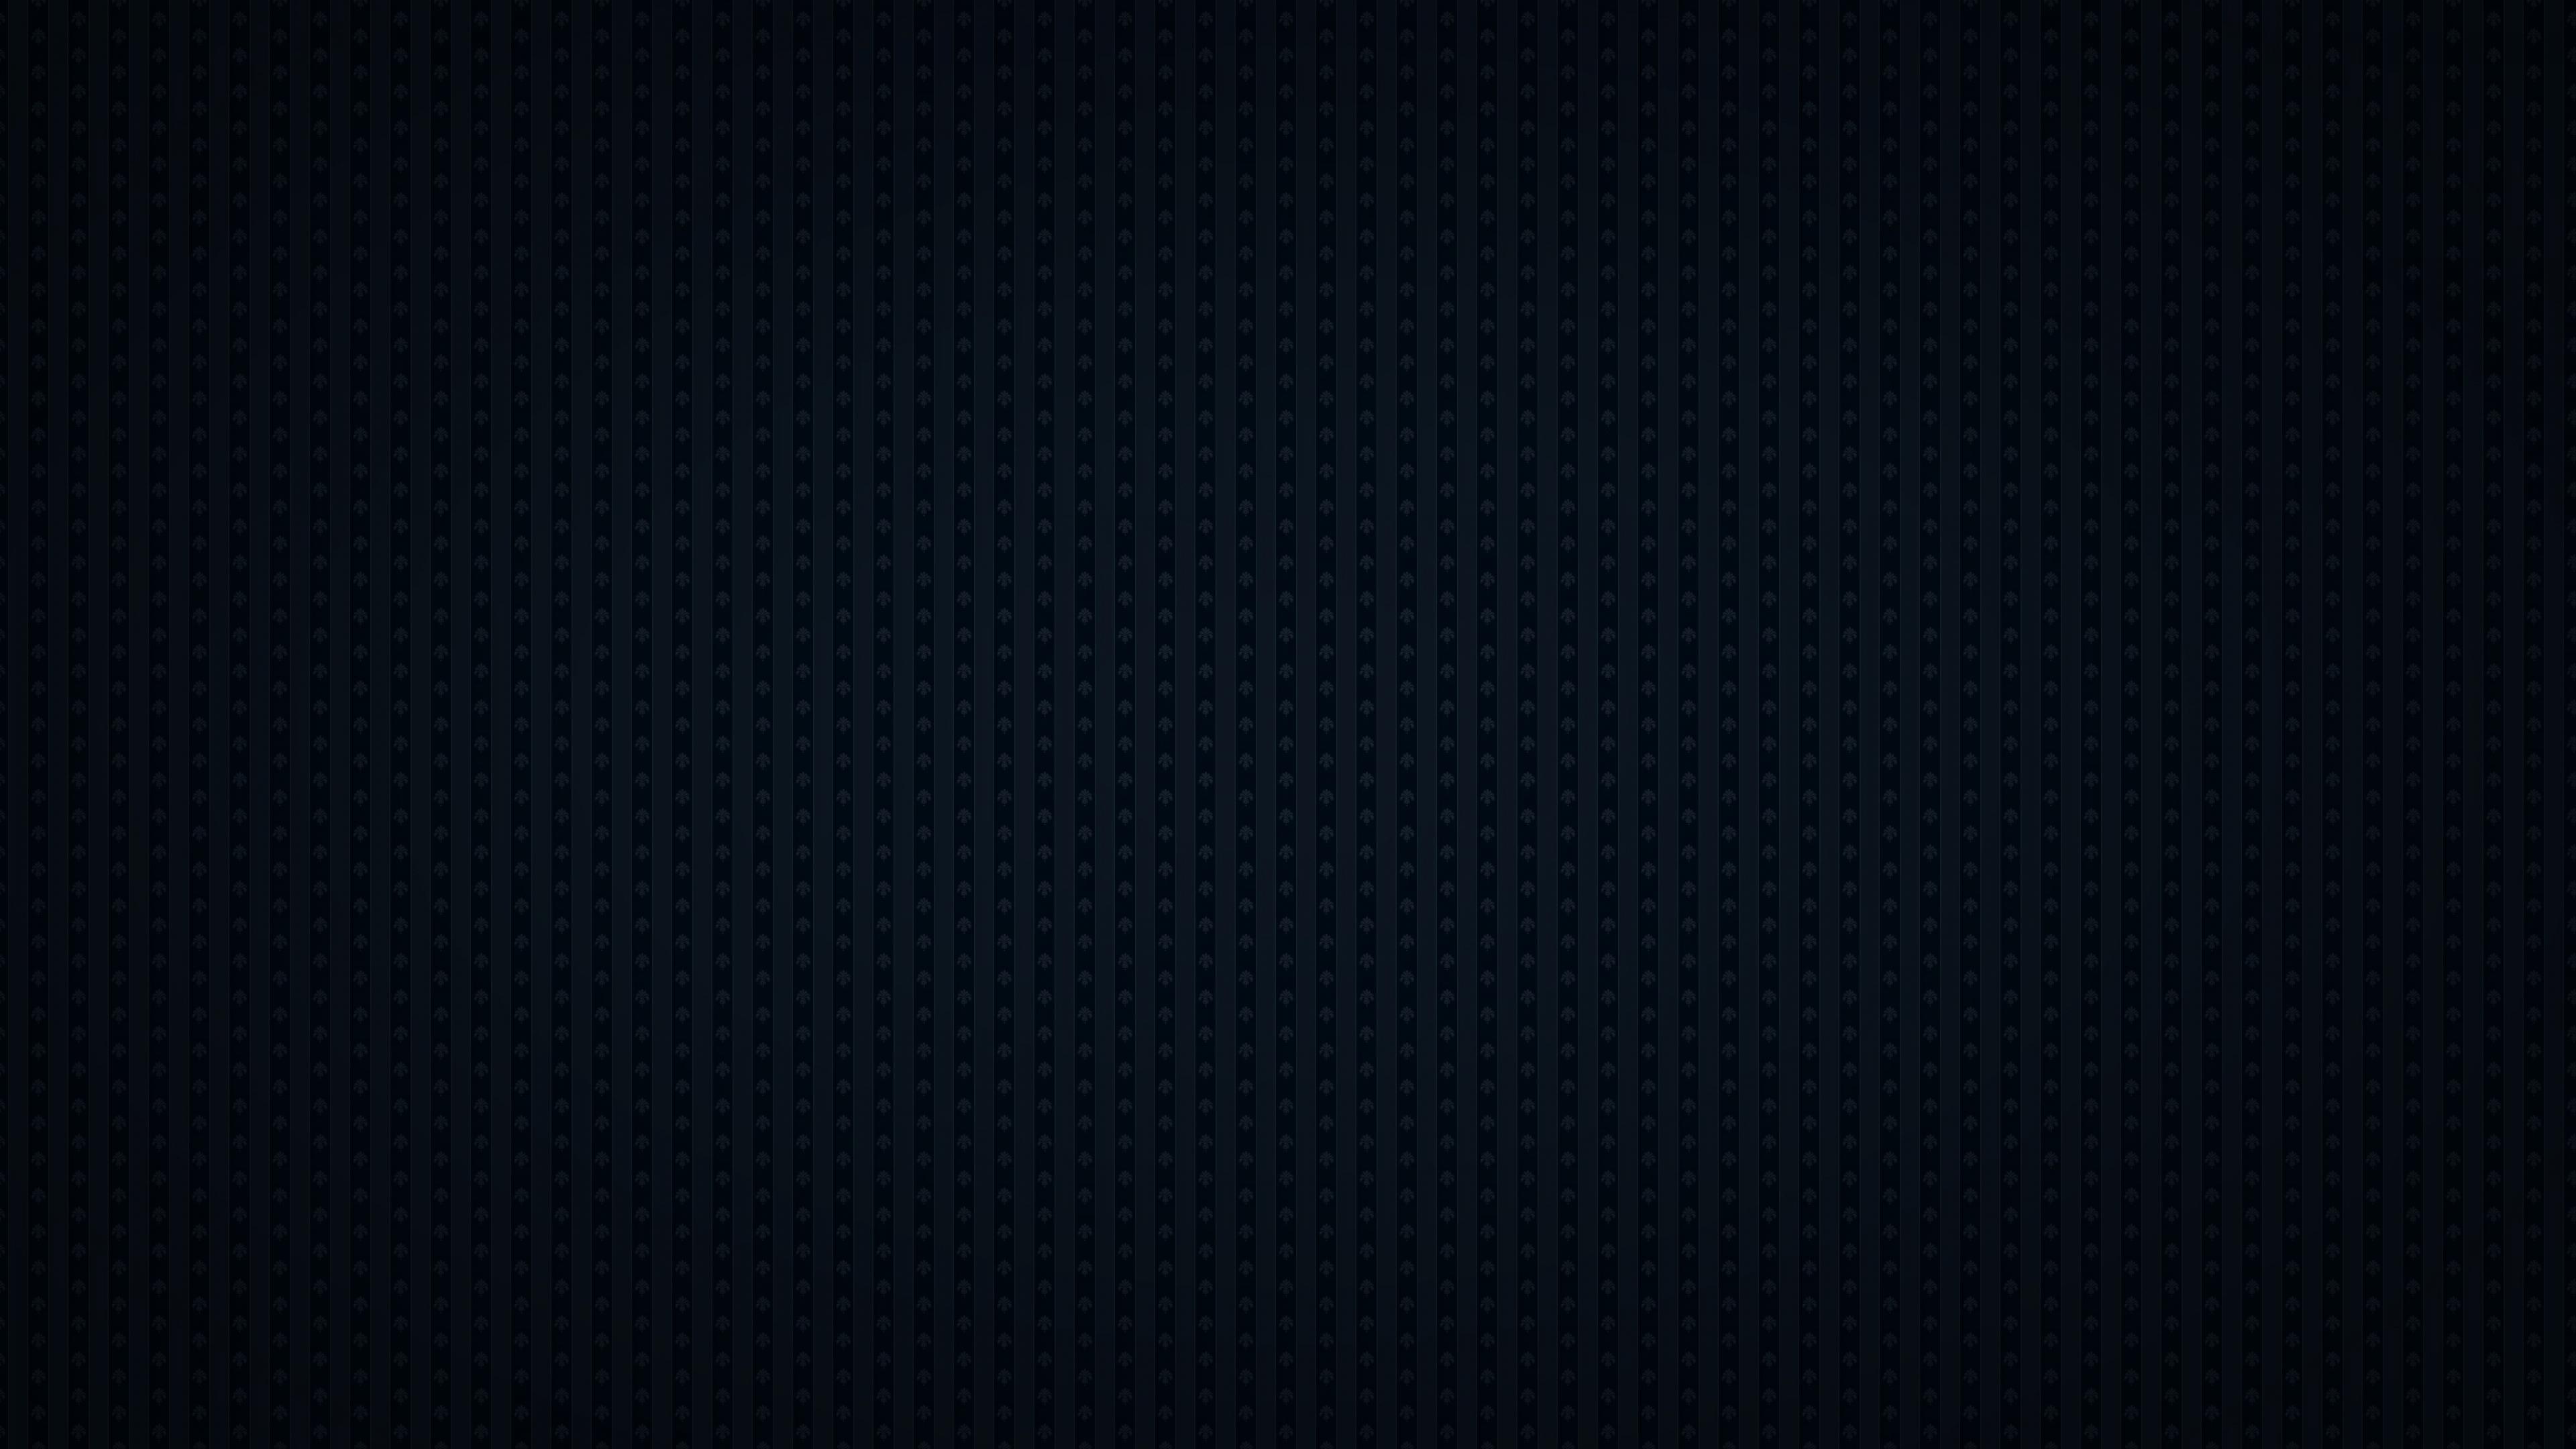 hd 4k texture wallpapers navy backgrounds vertical dark background ultra pattern lines textured stripes desktop metal wallpapersafari parallel обои 1024